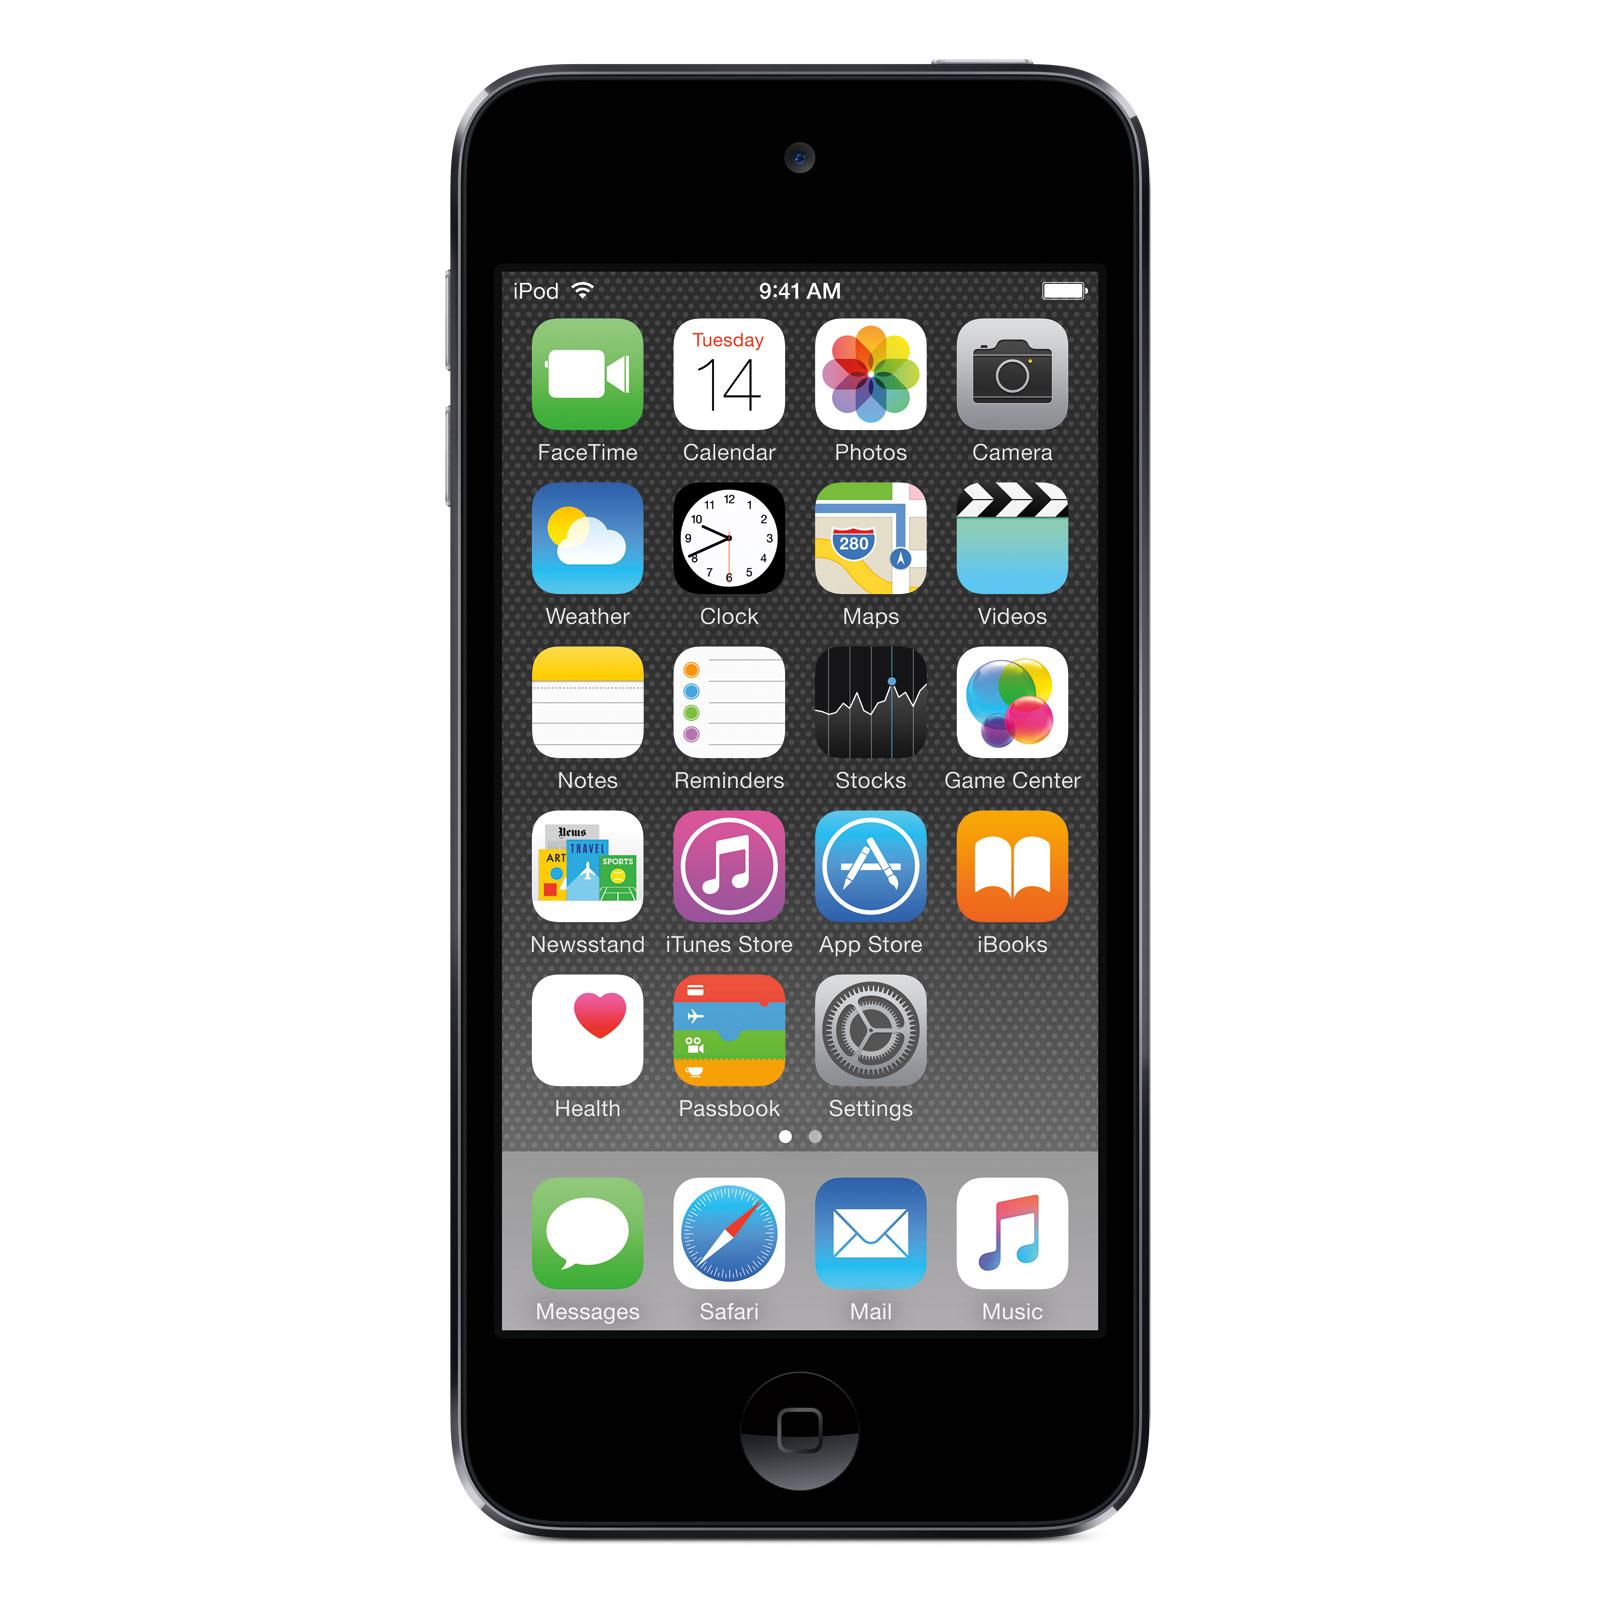 apple ipod touch 32 go gris sid ral 2015 lecteur mp3 ipod apple sur. Black Bedroom Furniture Sets. Home Design Ideas